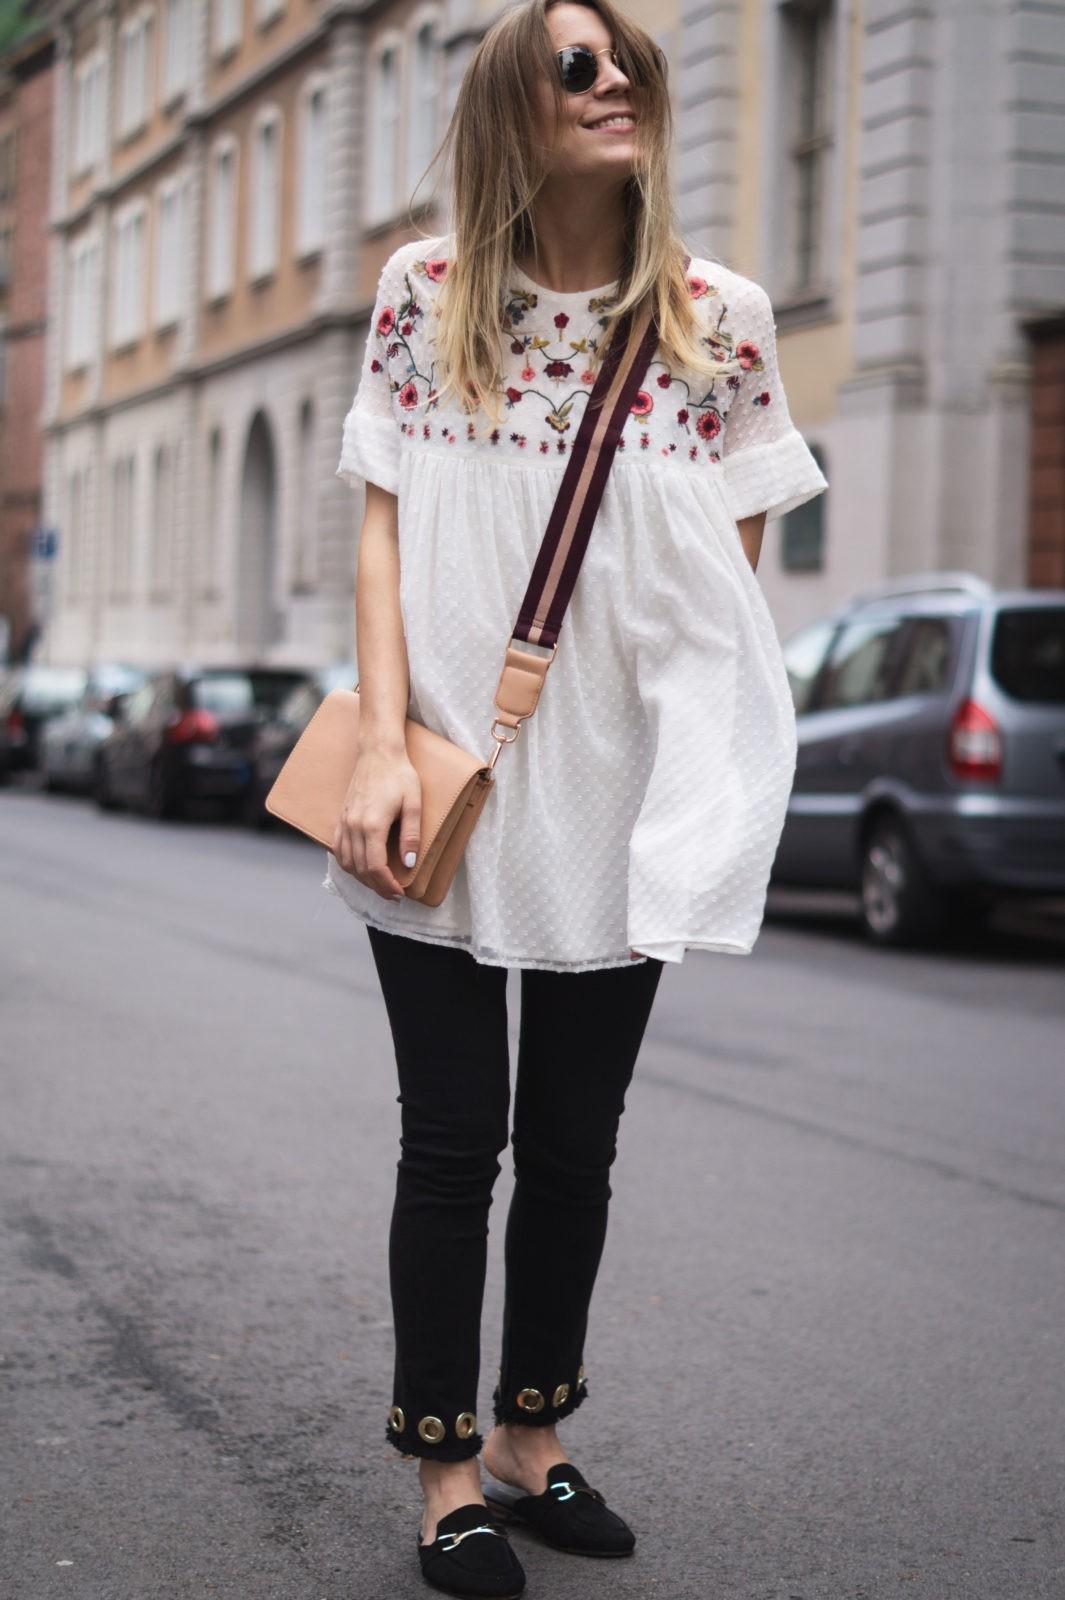 Floral Summer Dress Zara Jumpsuit Black Loafers Pantoletten Sommerkleid Streetstyle Heidelberg Sariety Modeblog Smile Happy Girl